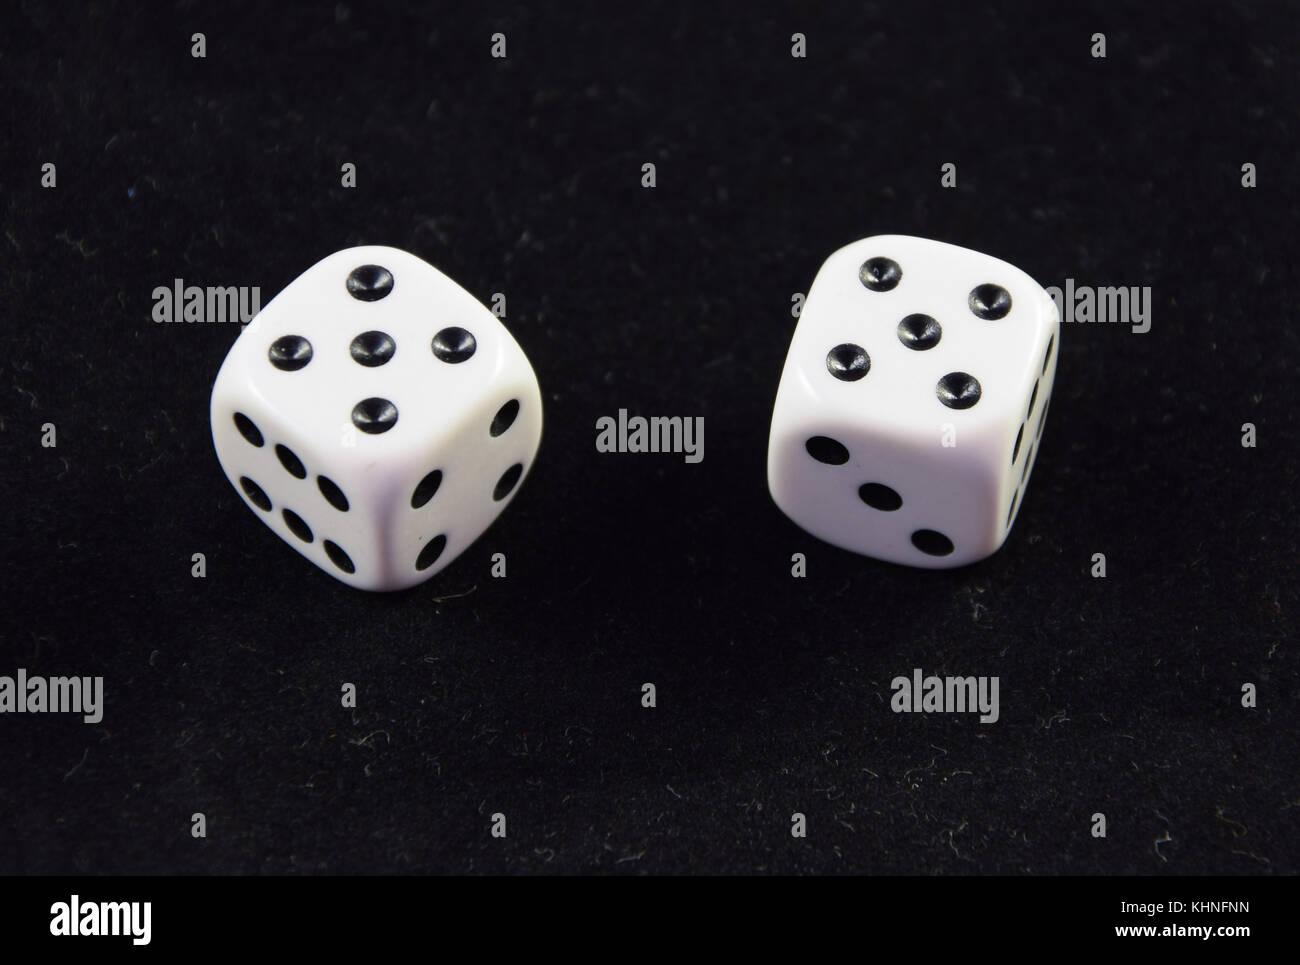 Six Sided Im Genes De Stock Six Sided Fotos De Stock Alamy # Muebles Doblecinco